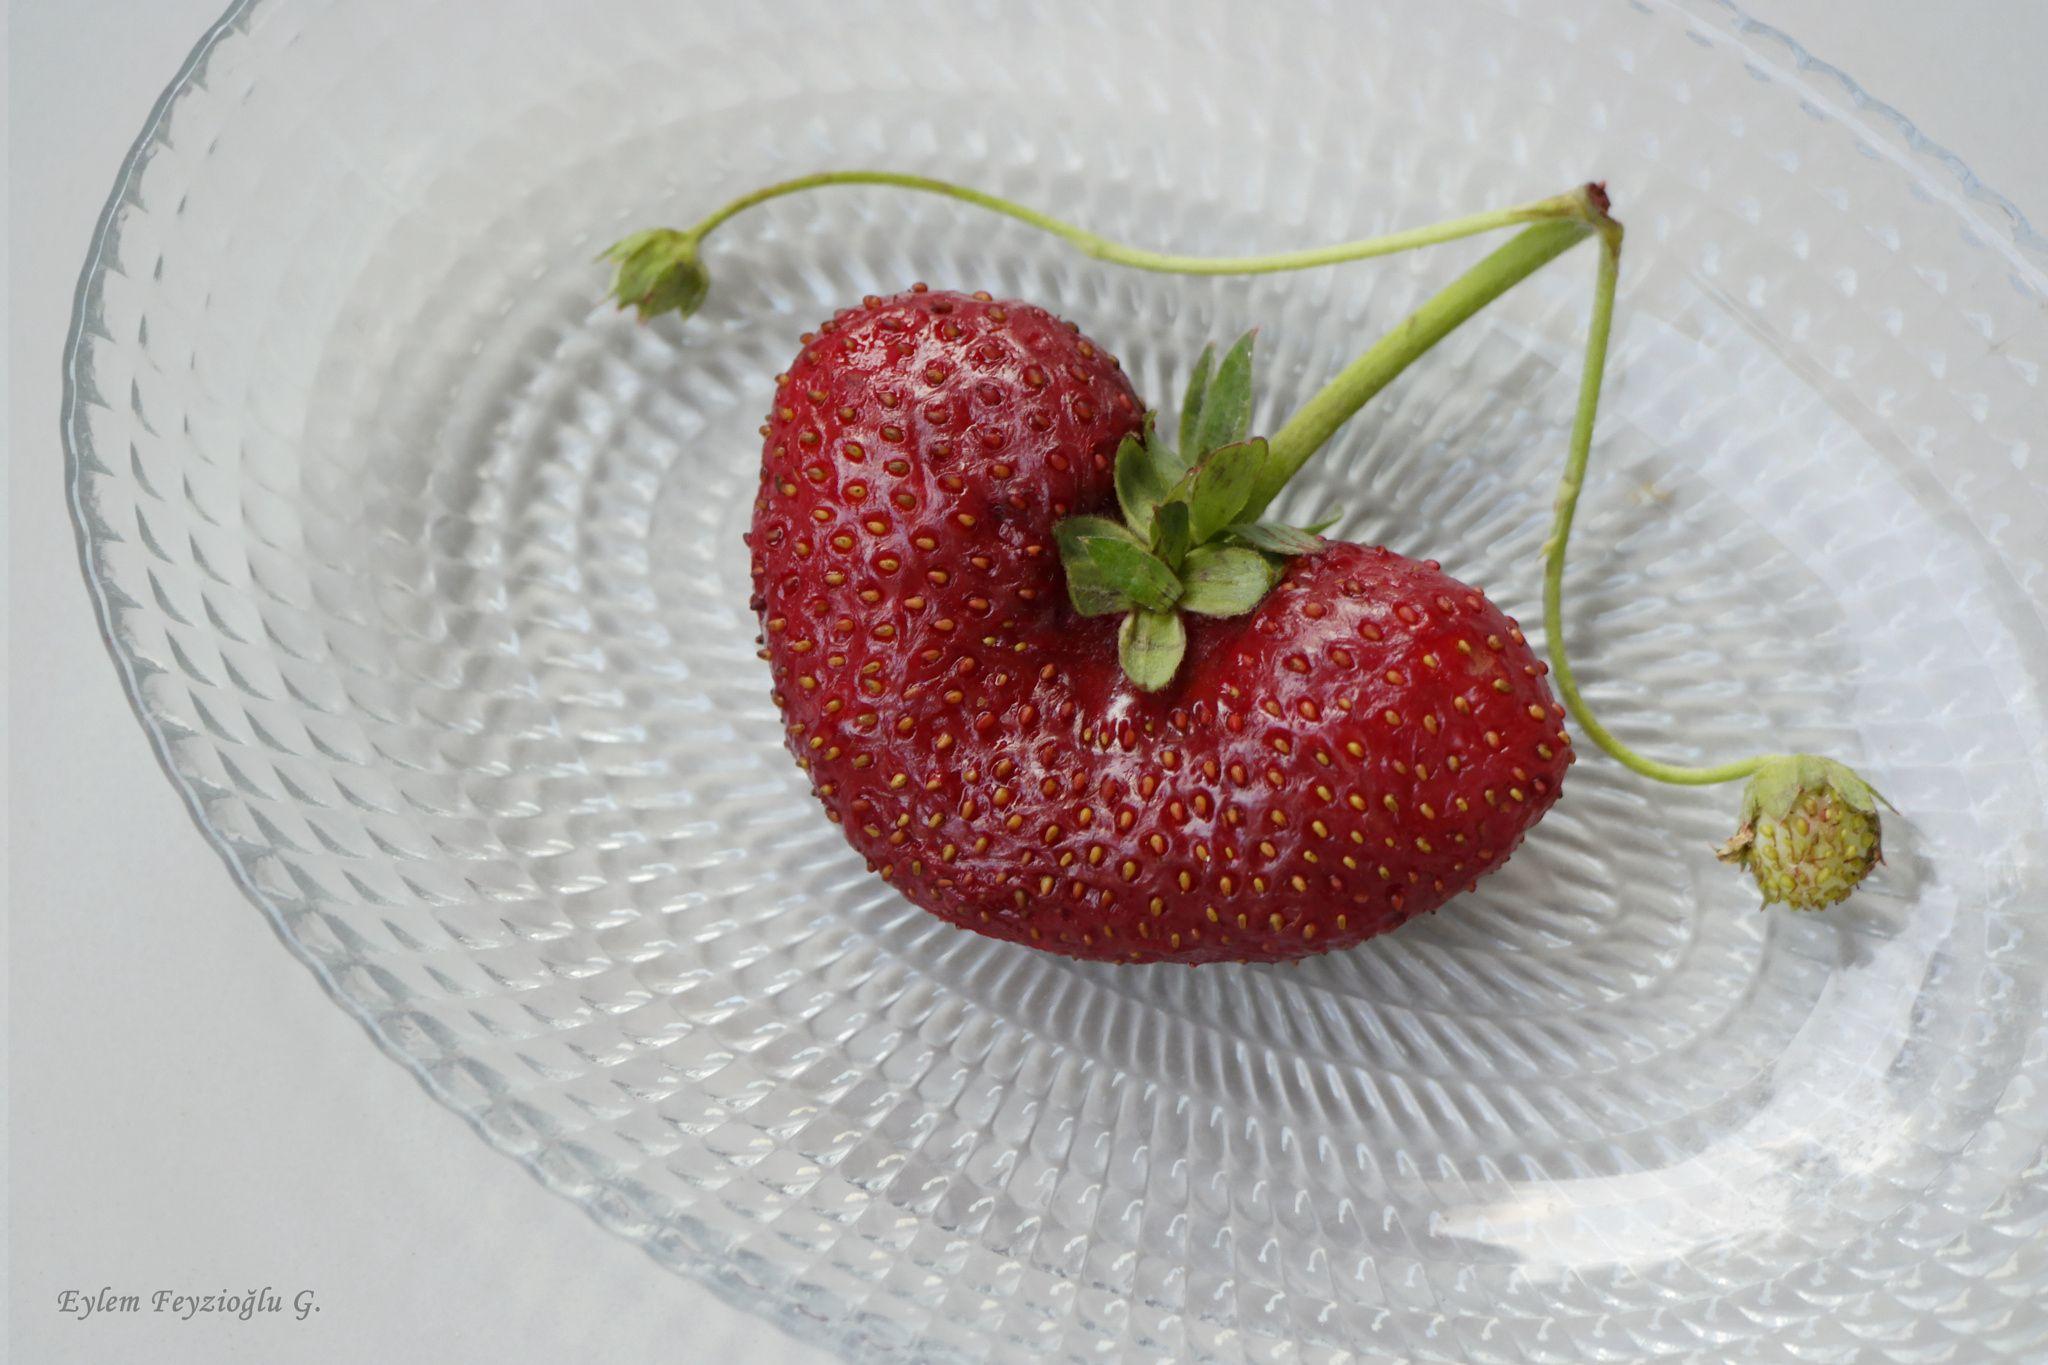 Strawberry Heart By H Eylem Feyzioglu Gezen On 500px